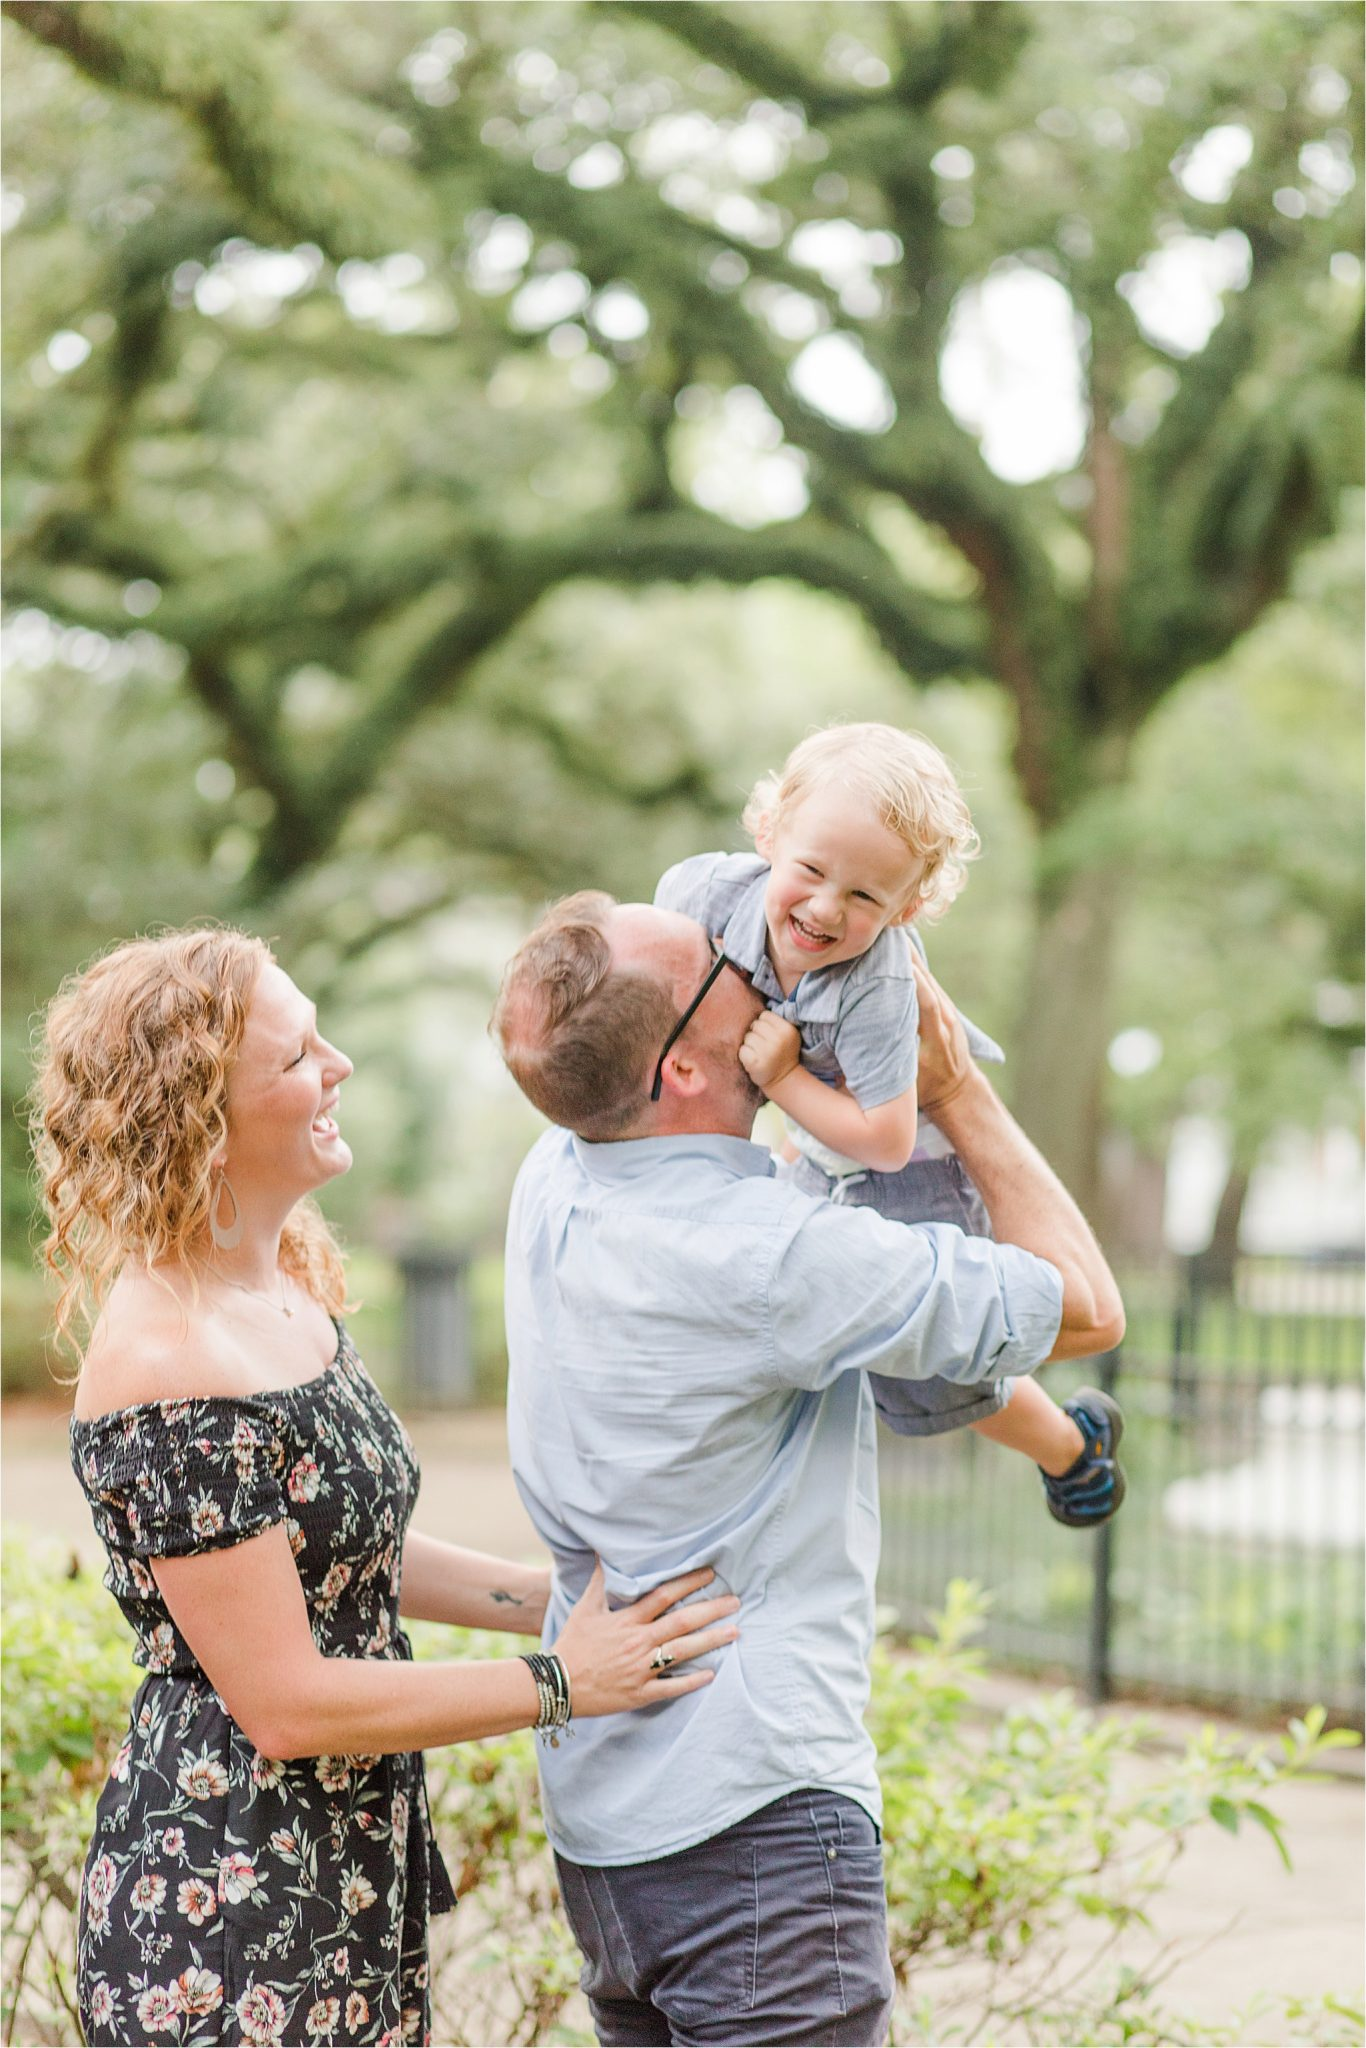 joyful family photos-Alabama Family Photography-mother father and son photos-family of three-candid family photography